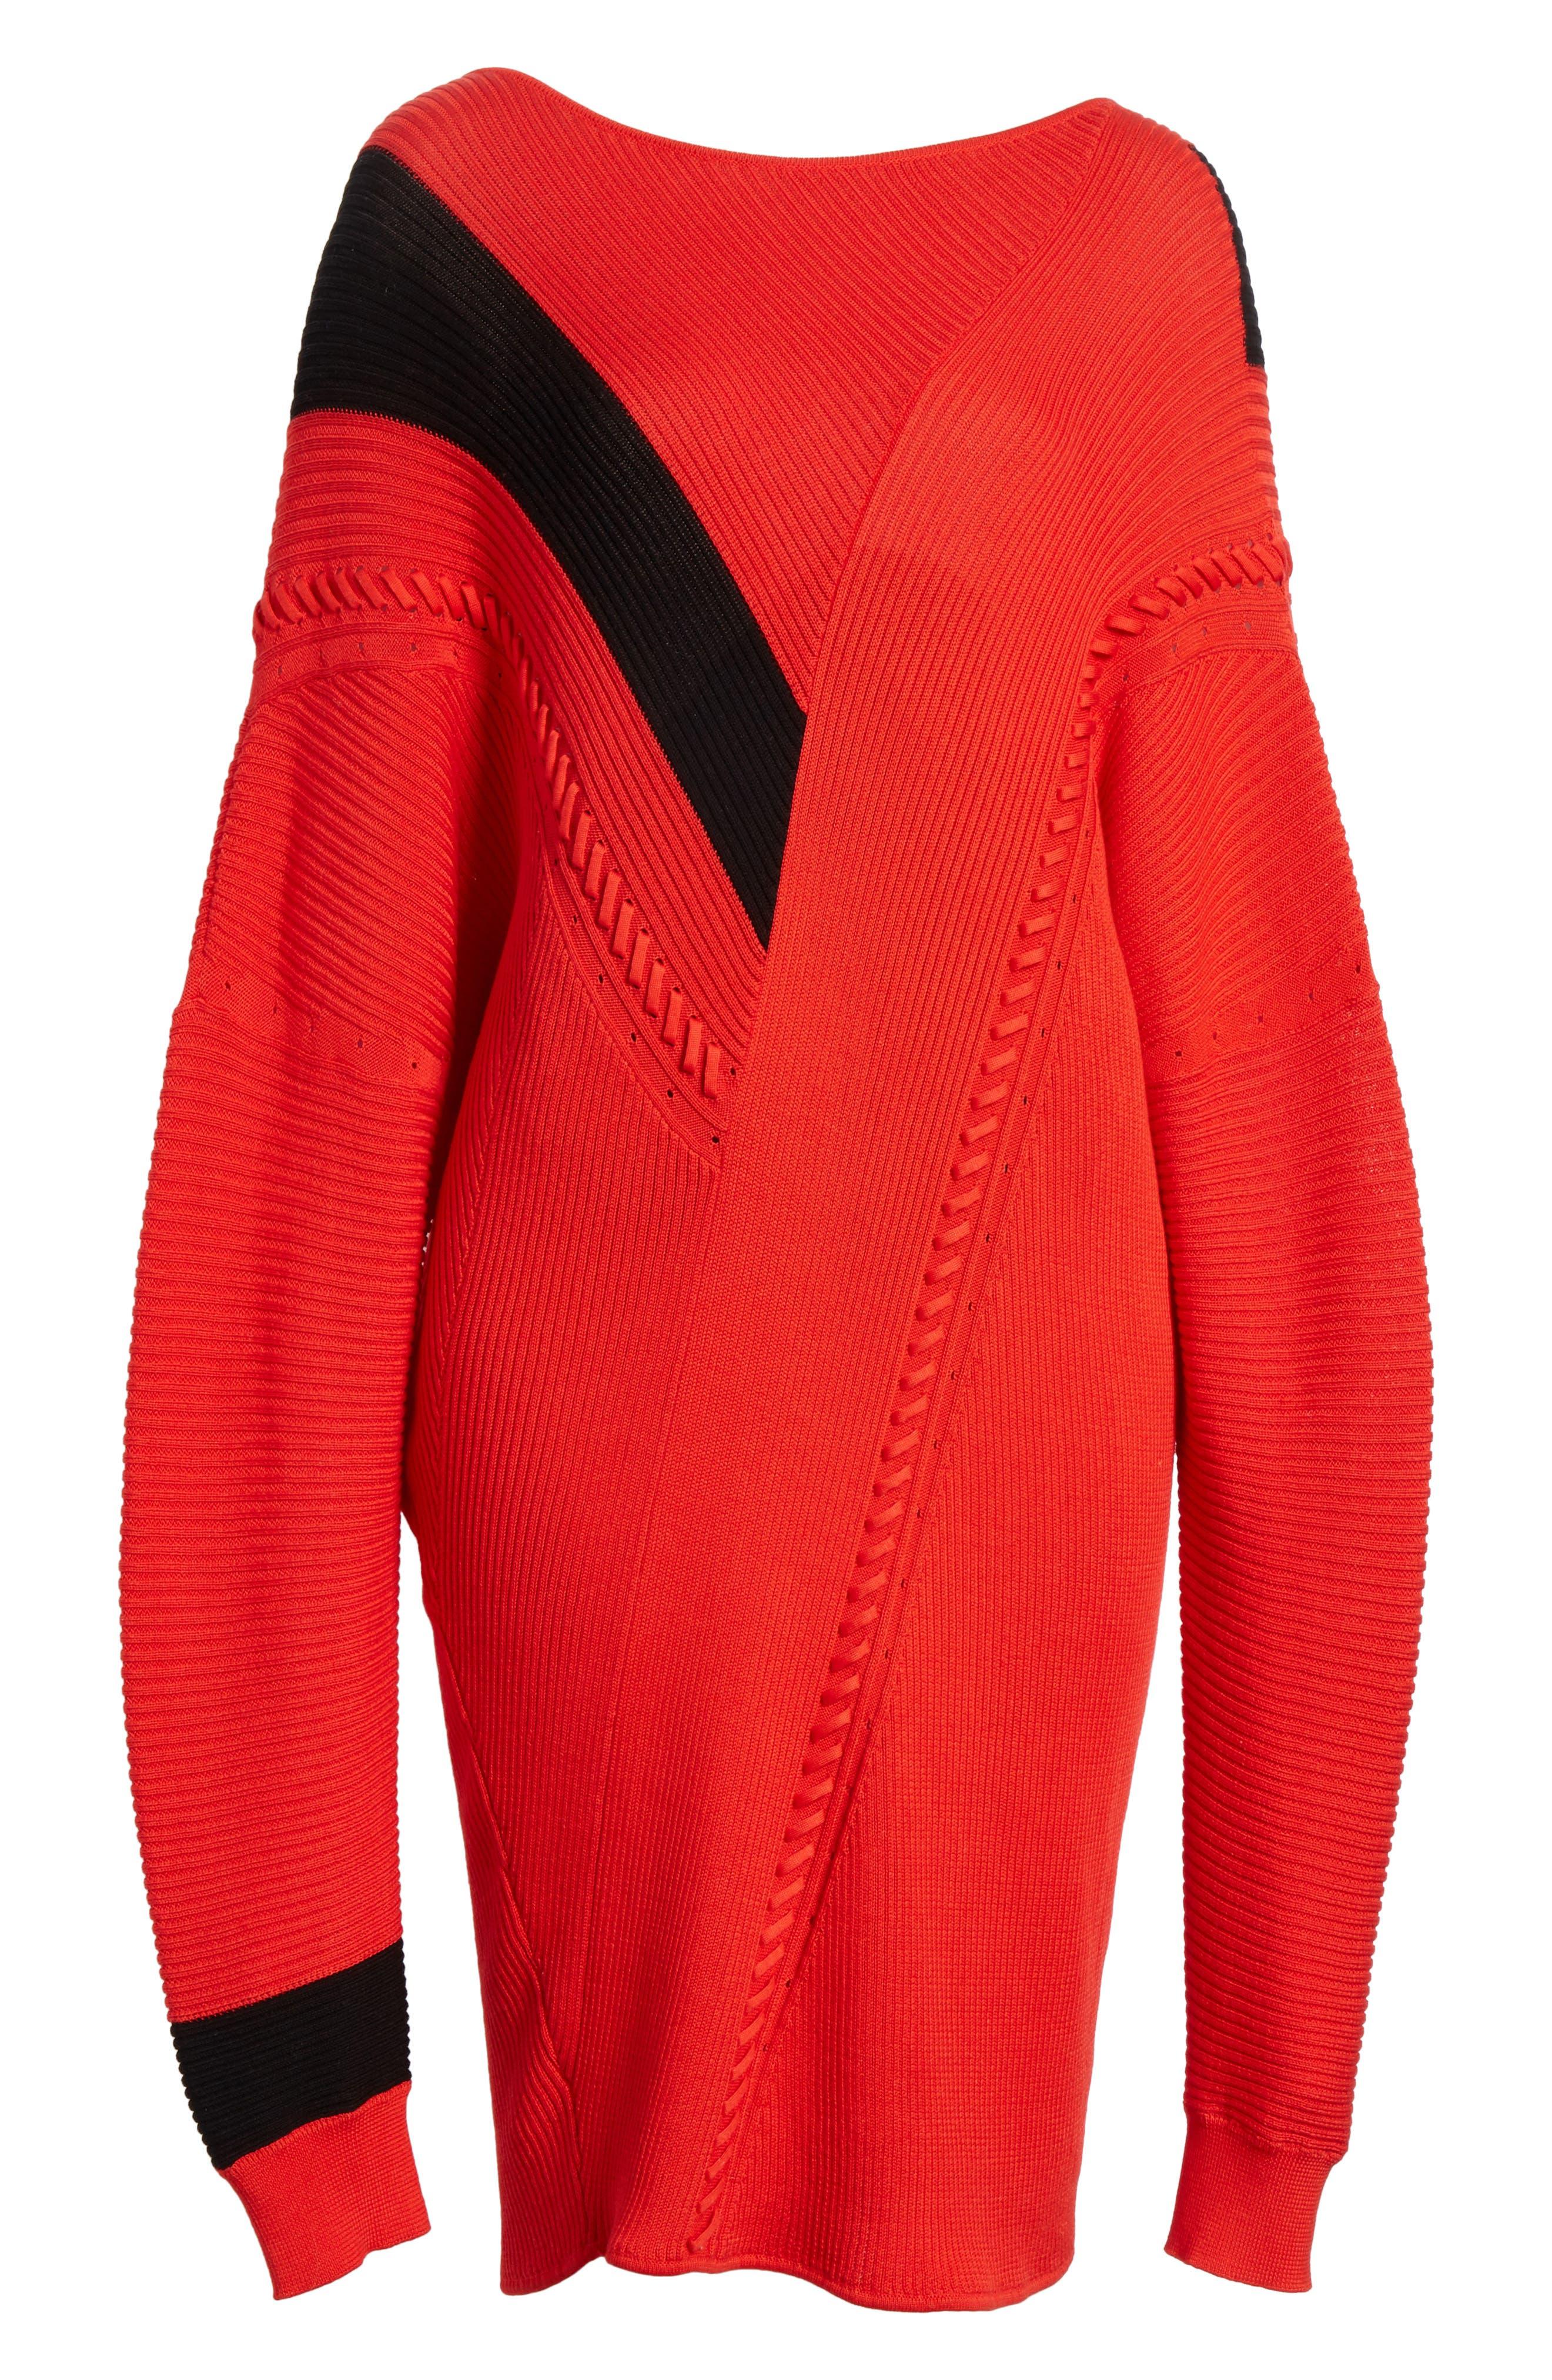 Cricket Reversible Sweater Dress,                             Alternate thumbnail 6, color,                             600